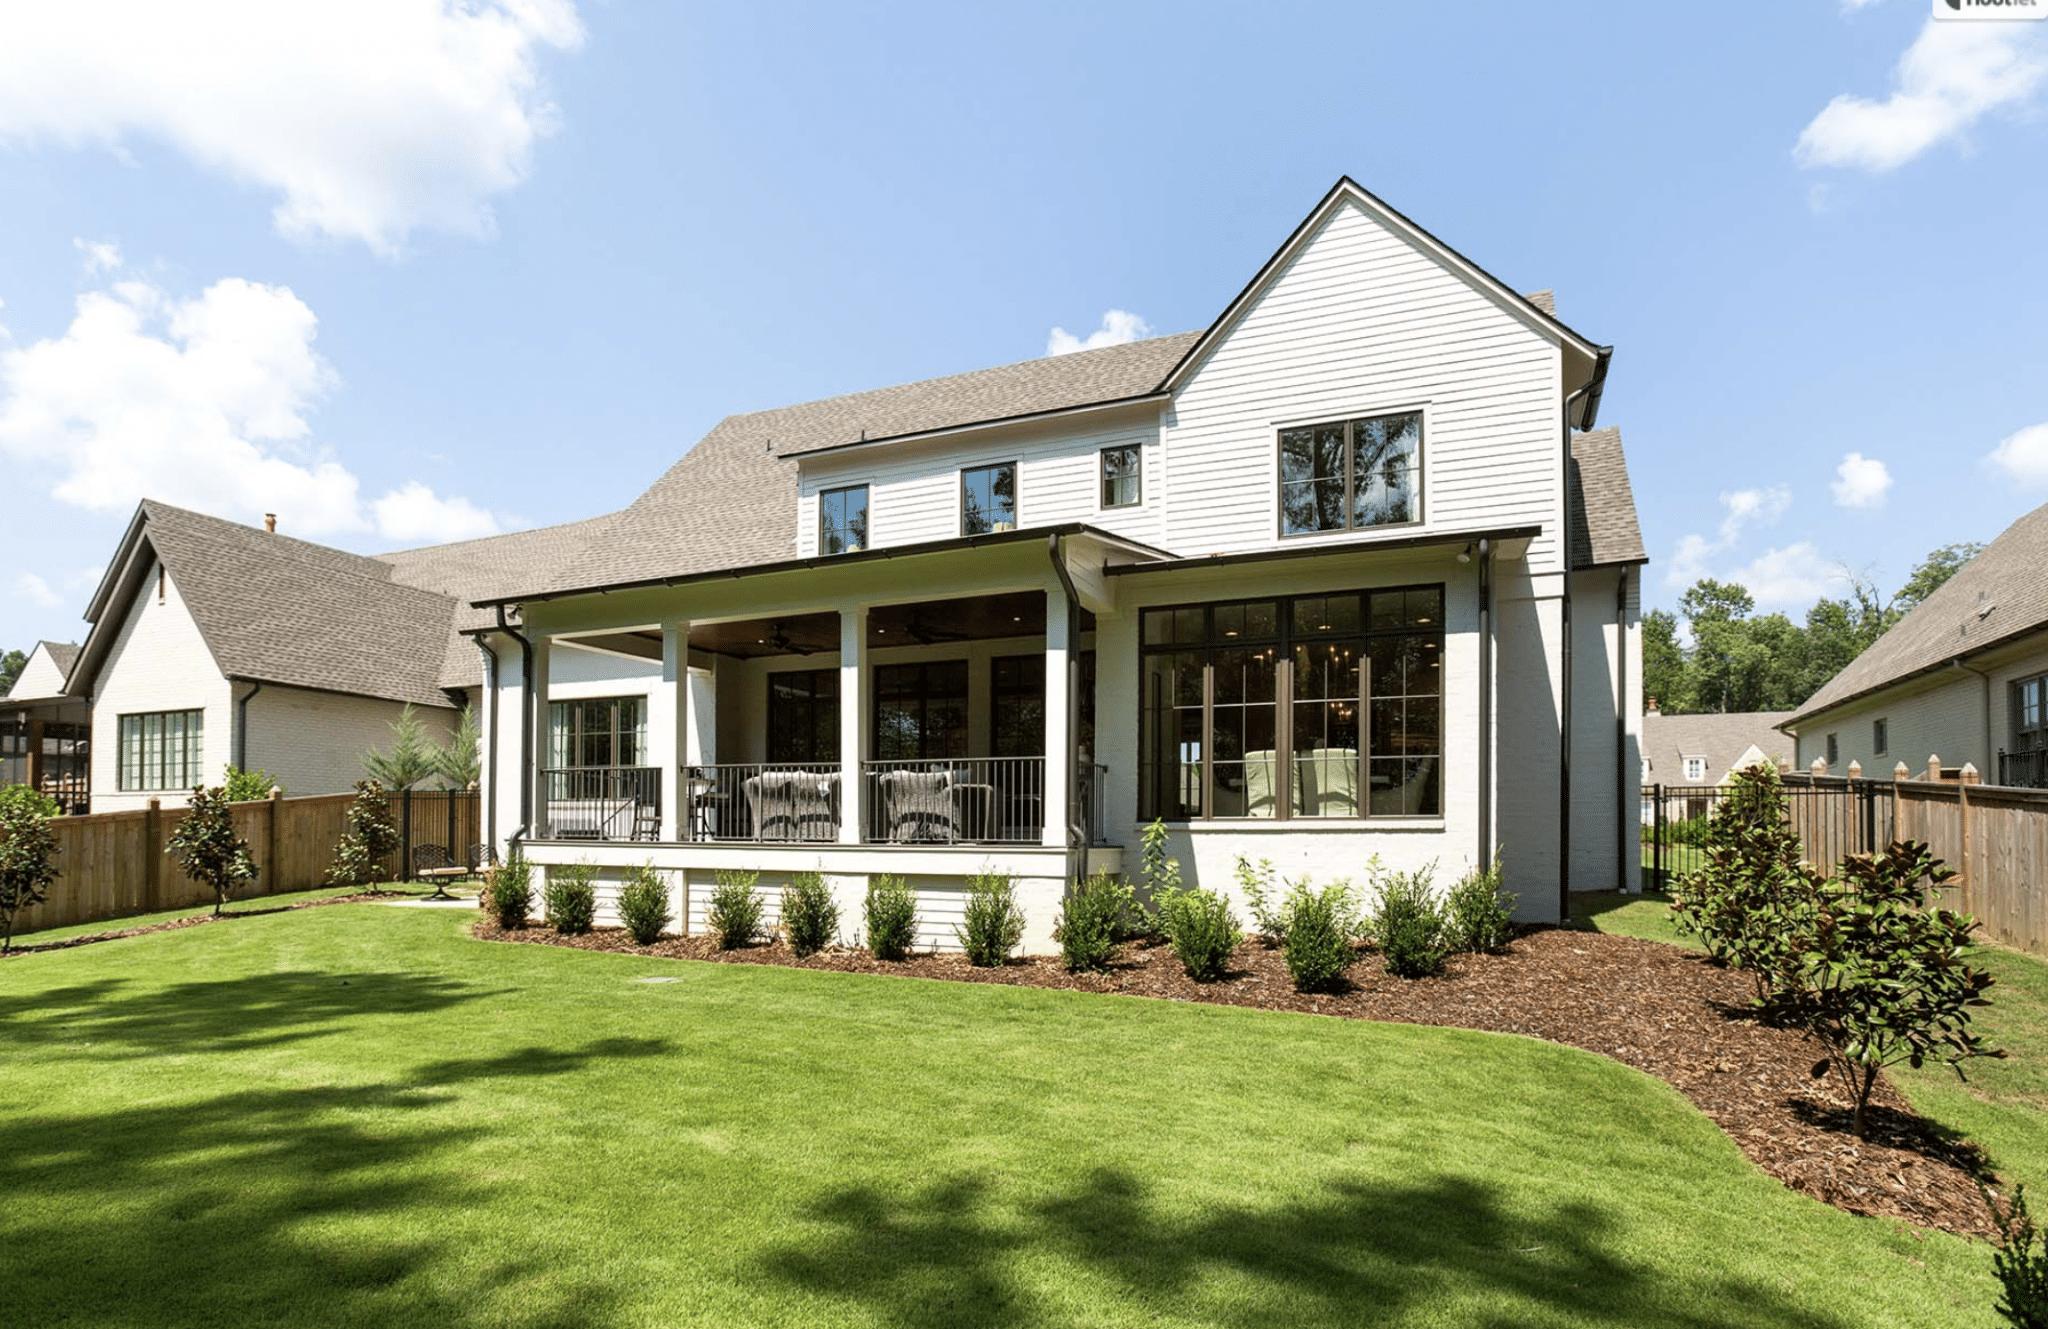 Residential Home Design Ideas One Source Windows & Doors Oklahoma